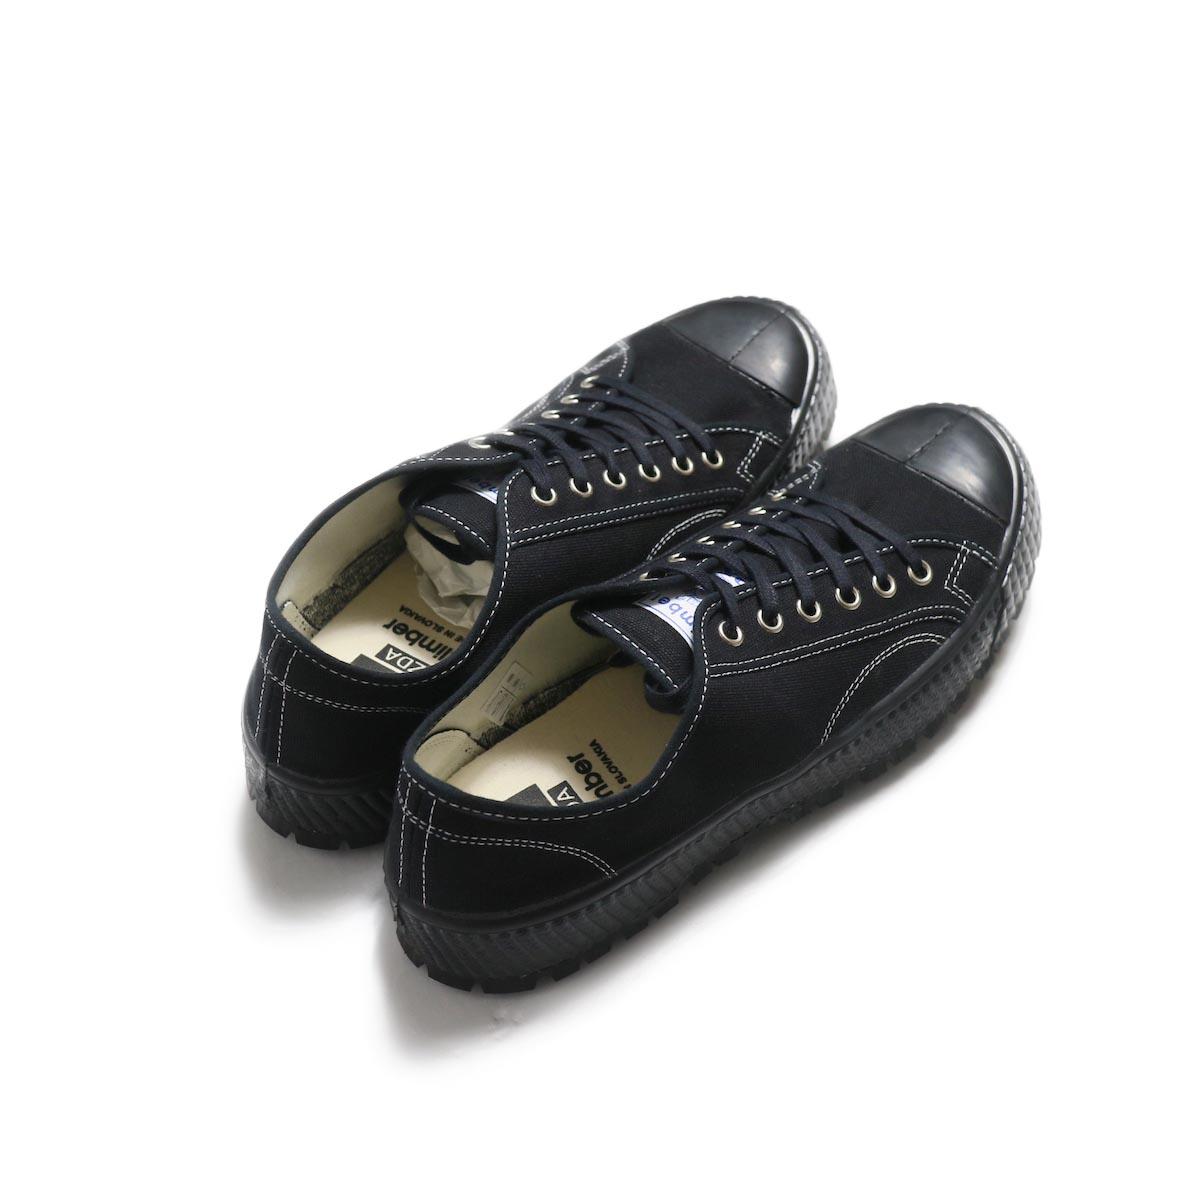 ZDA / 2100-F Climber Sole Cnavas Sneaker (Black)背面